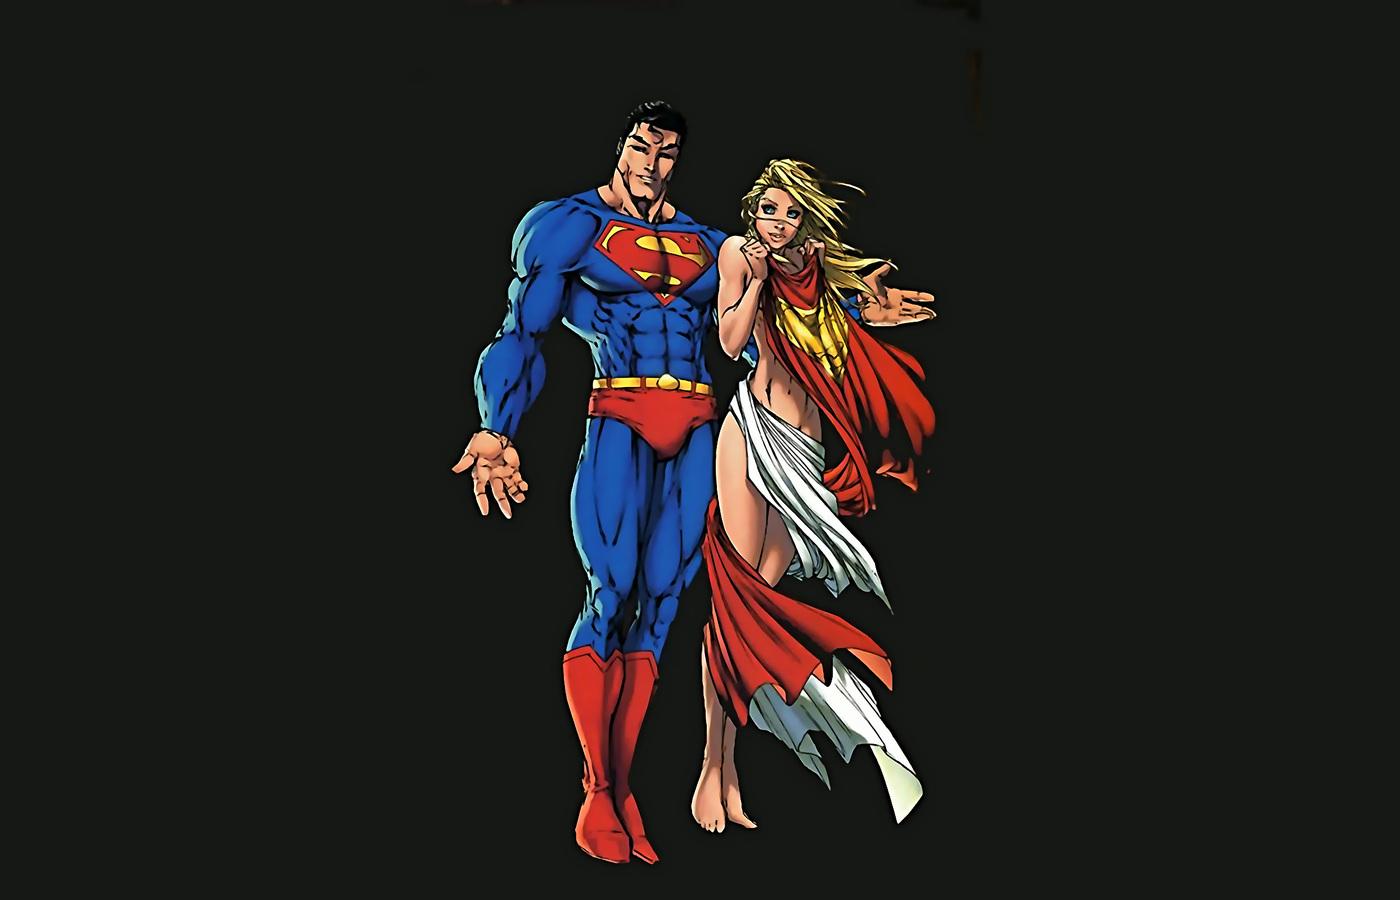 superman-and-supergirl-minimalism-artwork-3r.jpg